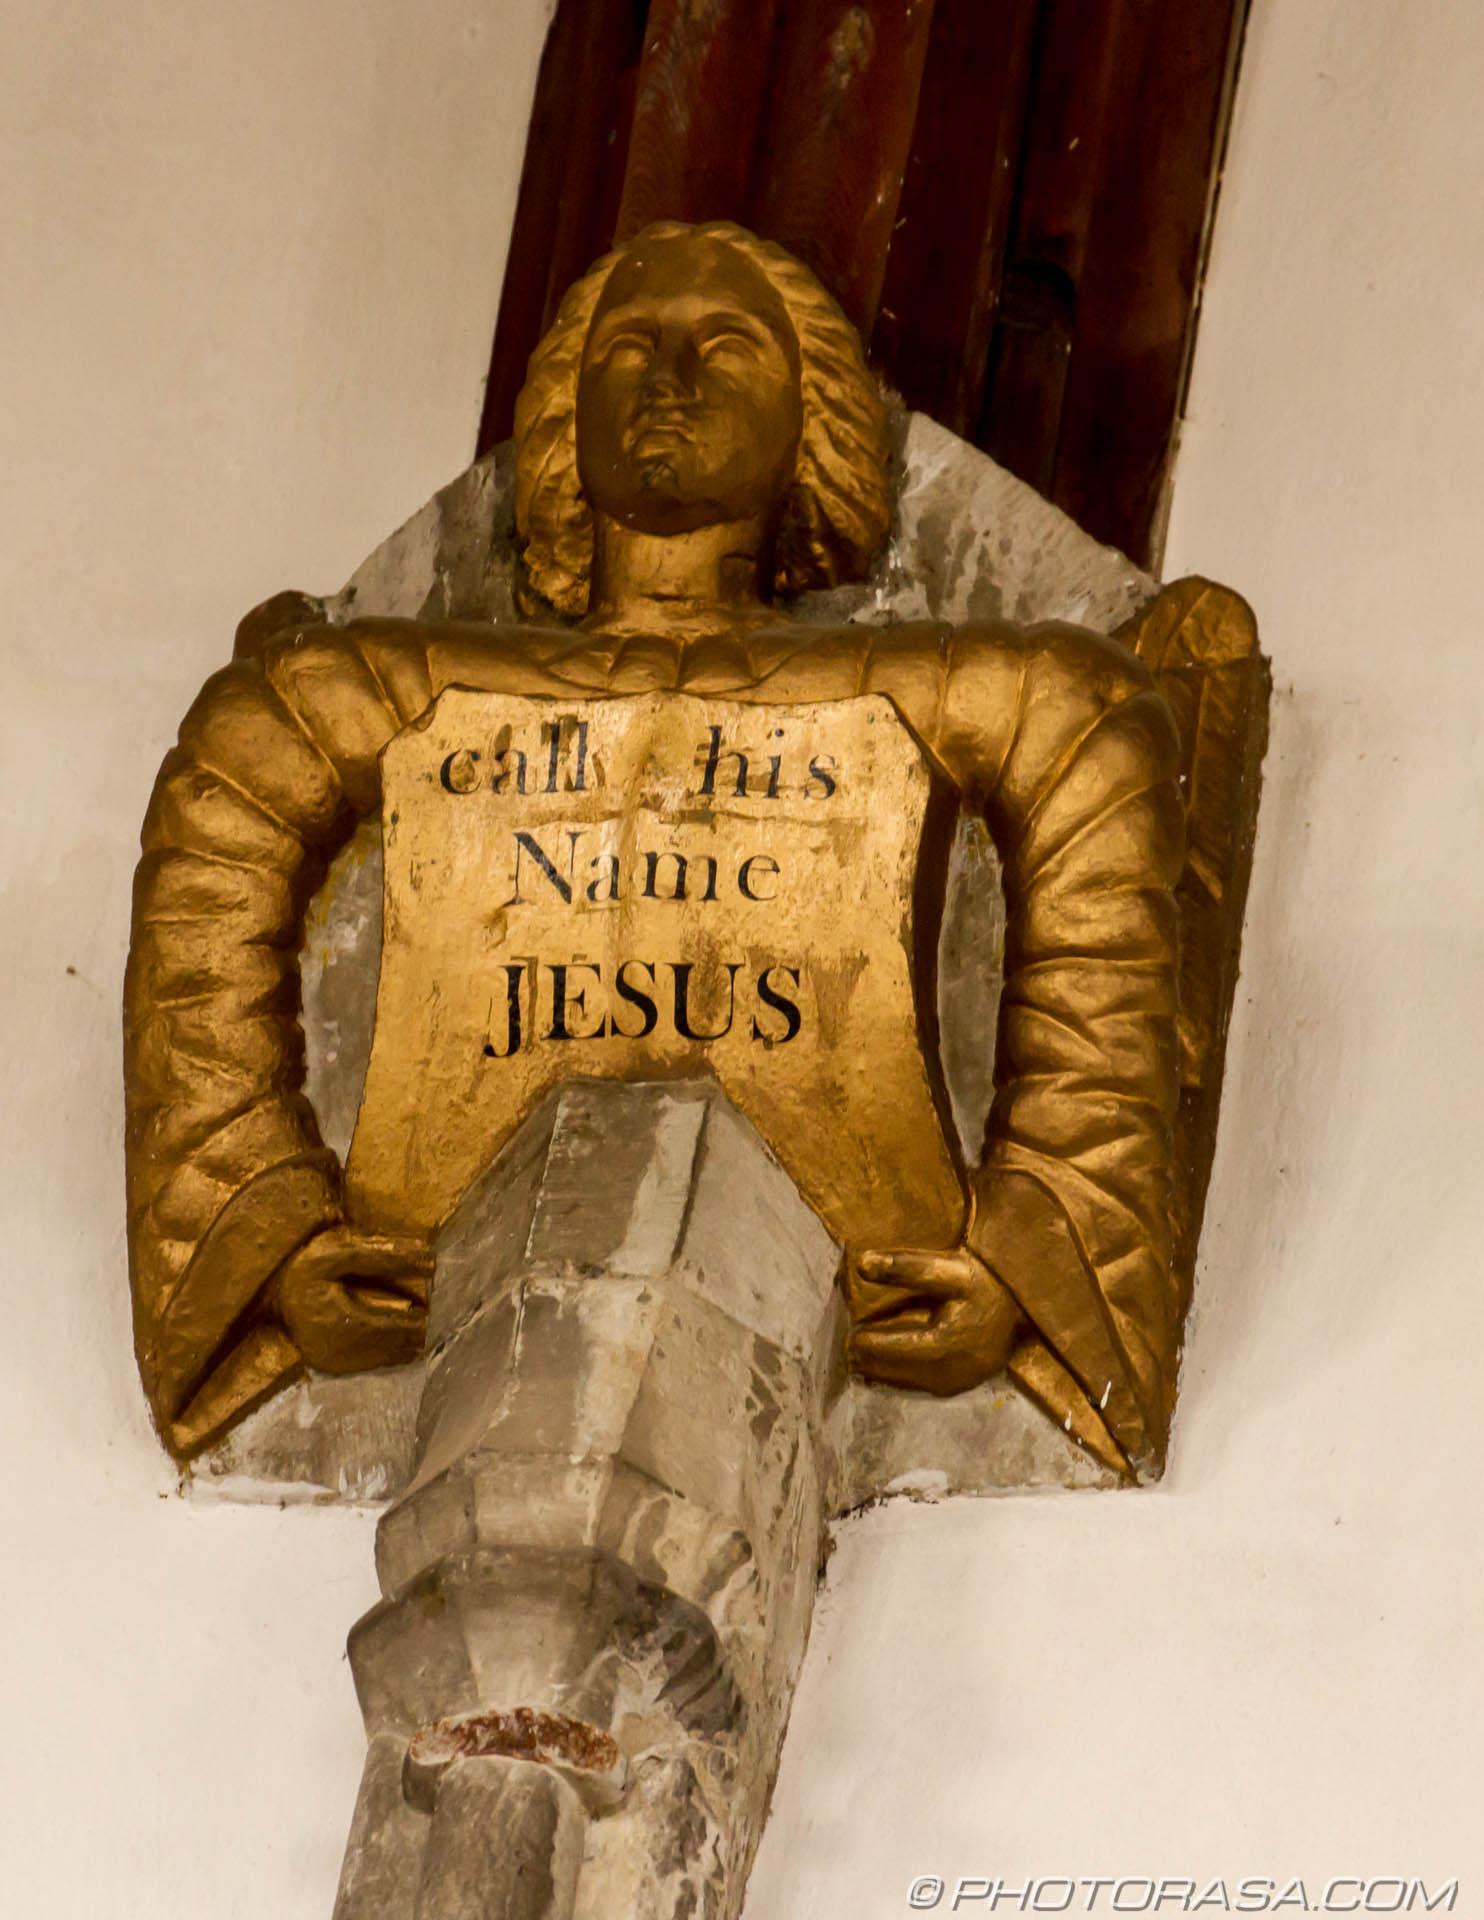 https://photorasa.com/st-dunstans-church-cranbrook/repaired-wall-carving/